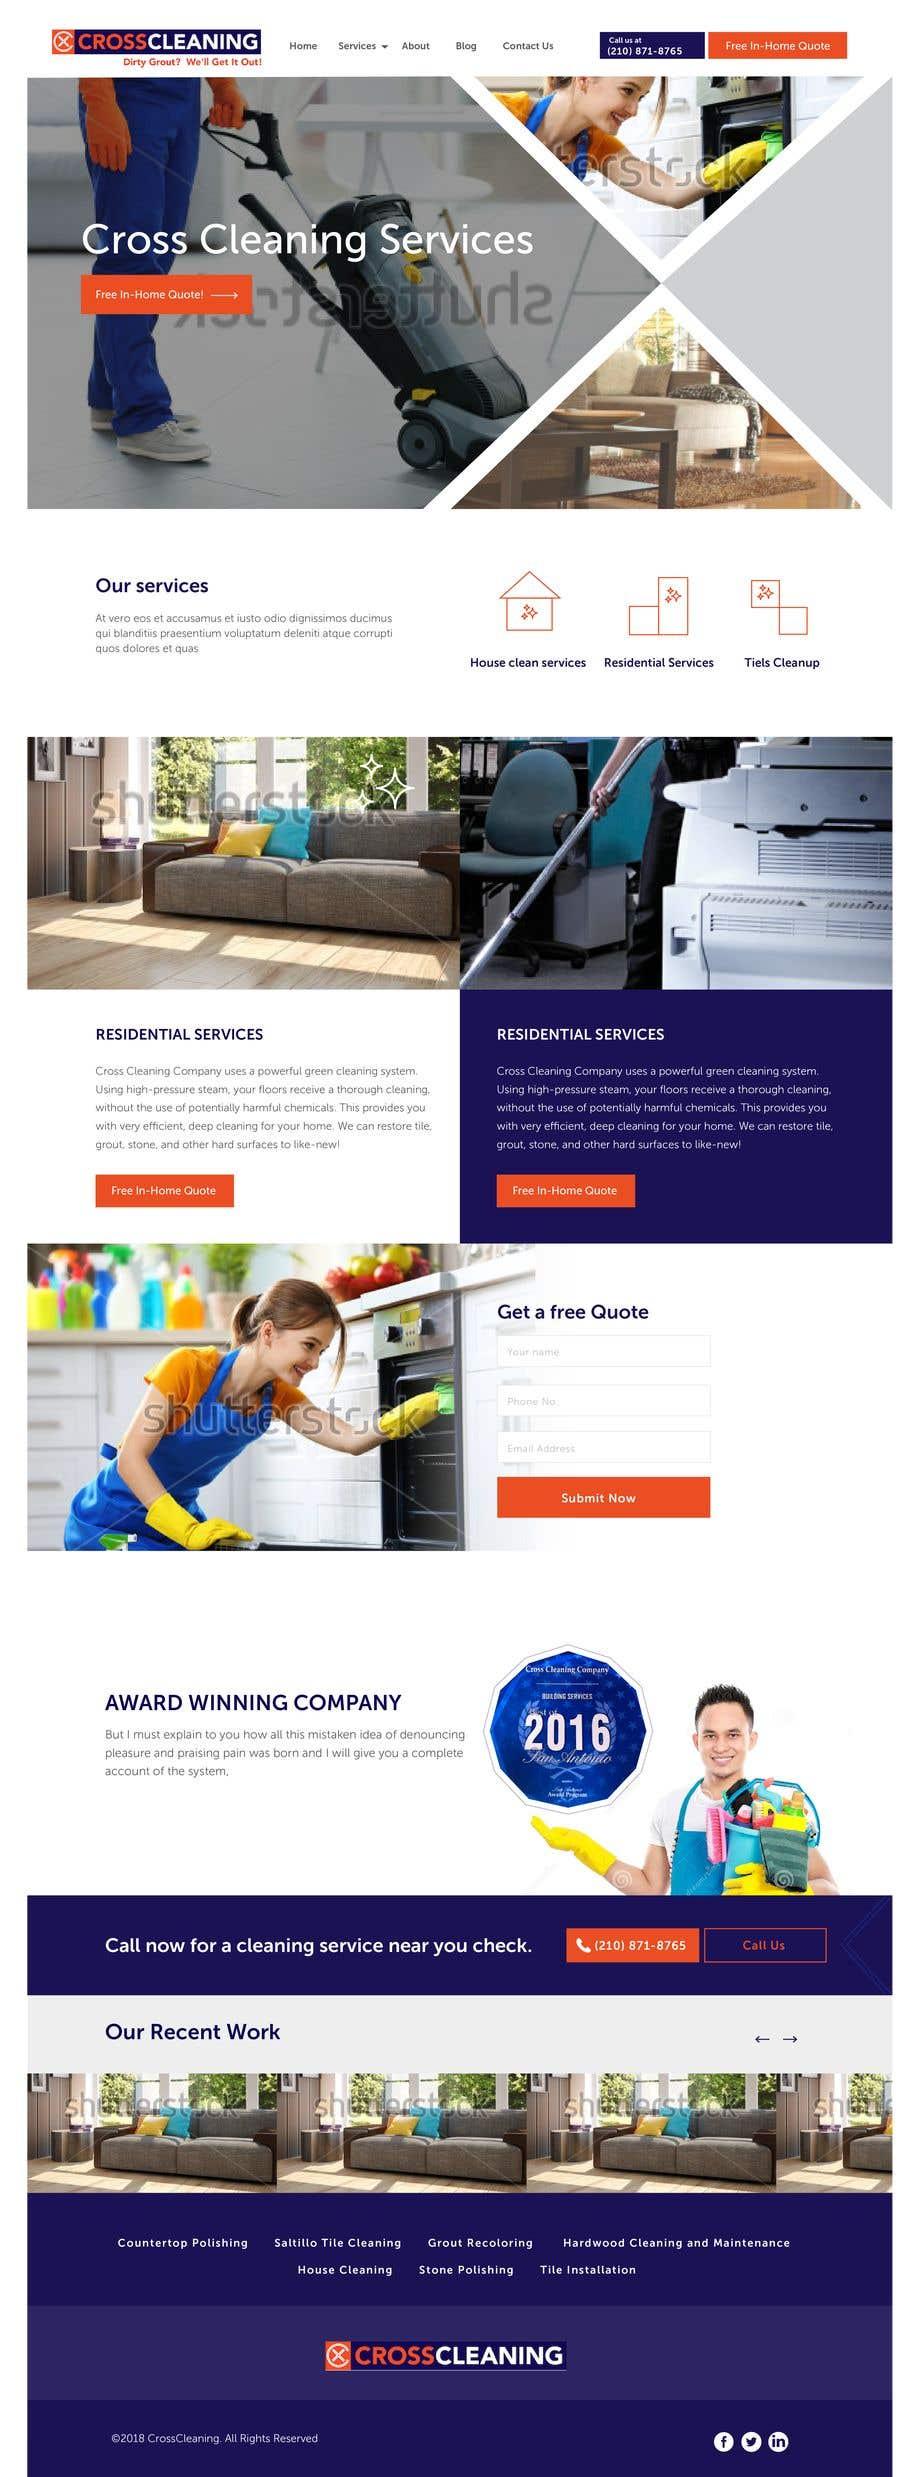 Kilpailutyö #40 kilpailussa Wow Me with Creative Redesign of Wordpress Website